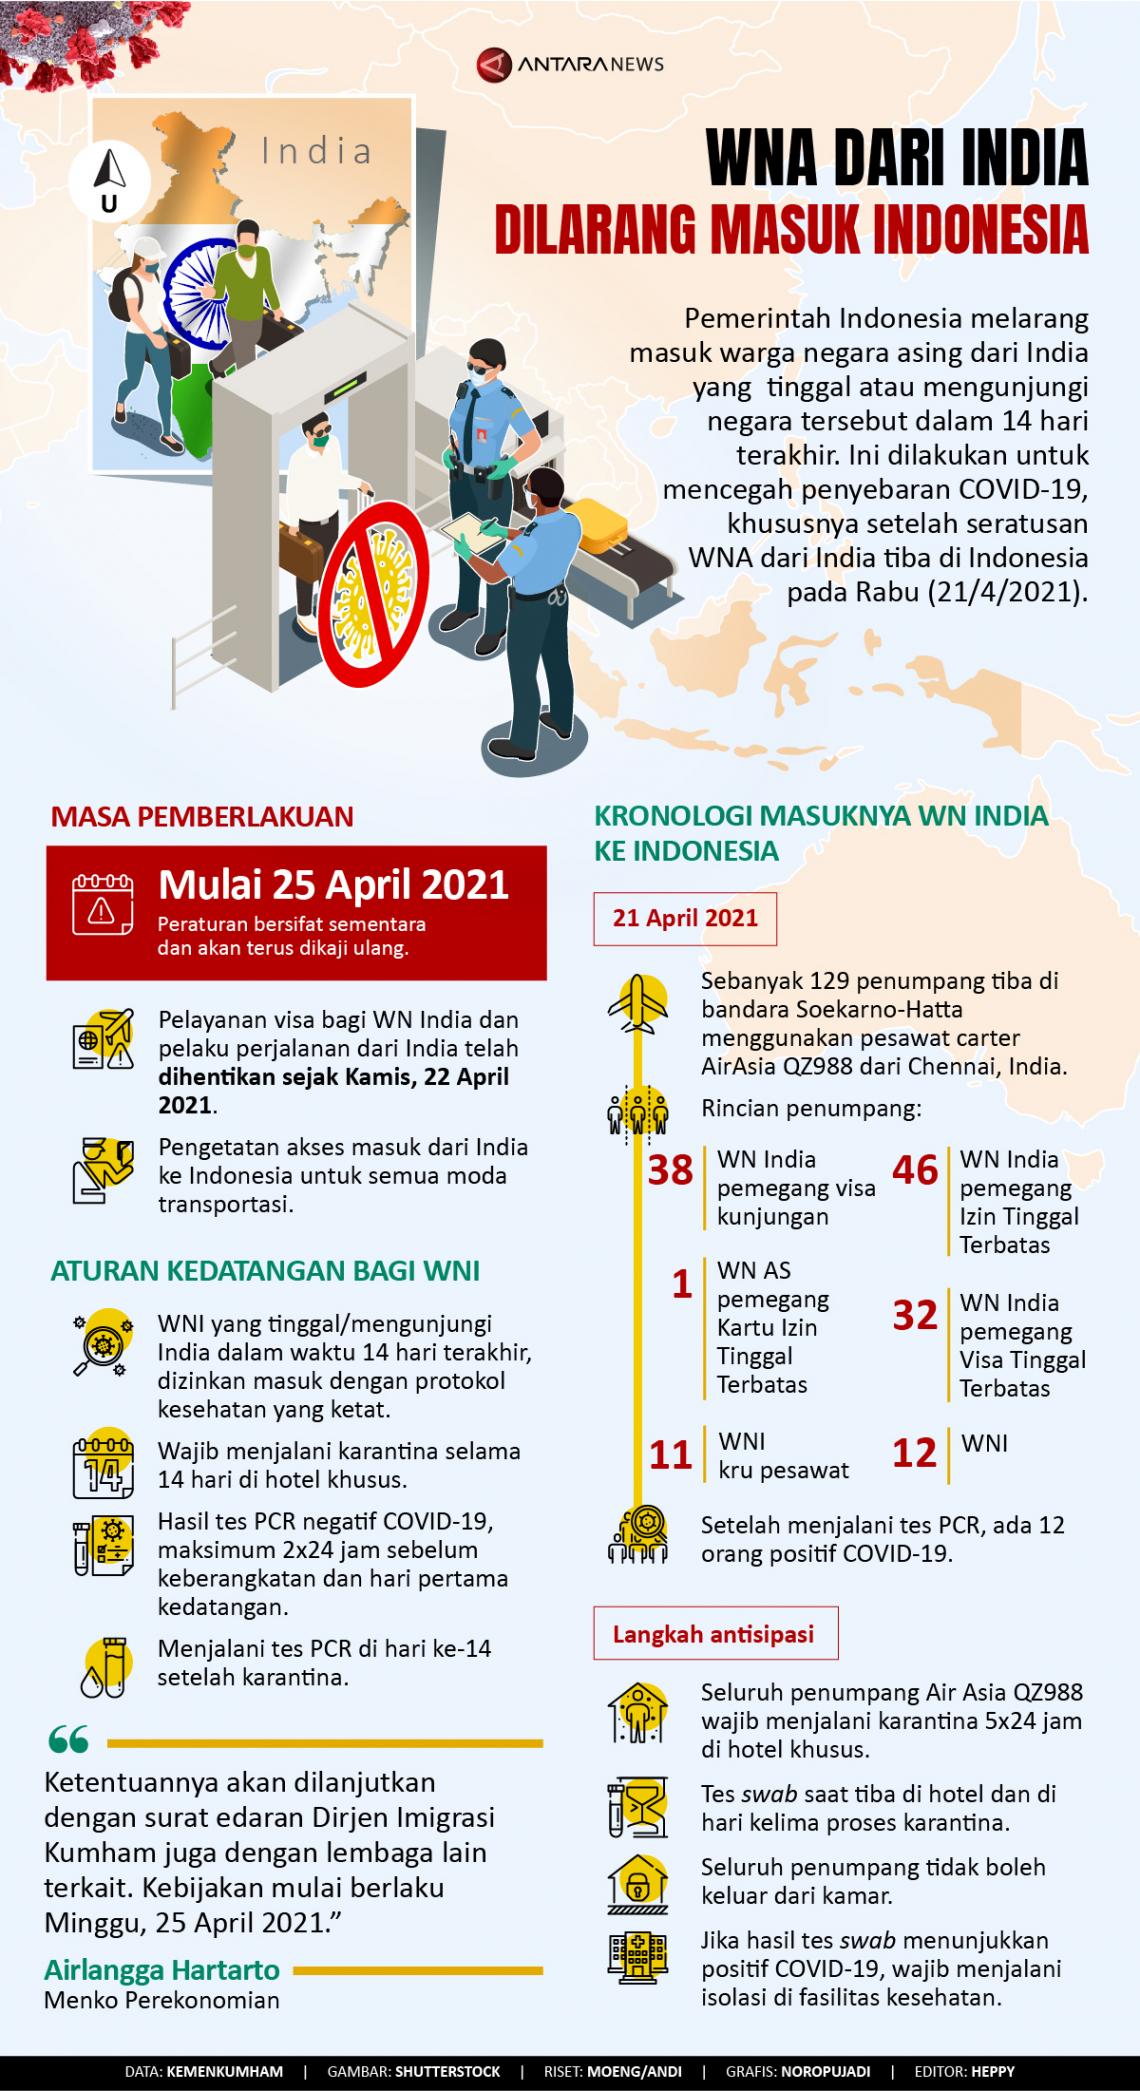 WNA dari India dilarang masuk Indonesia